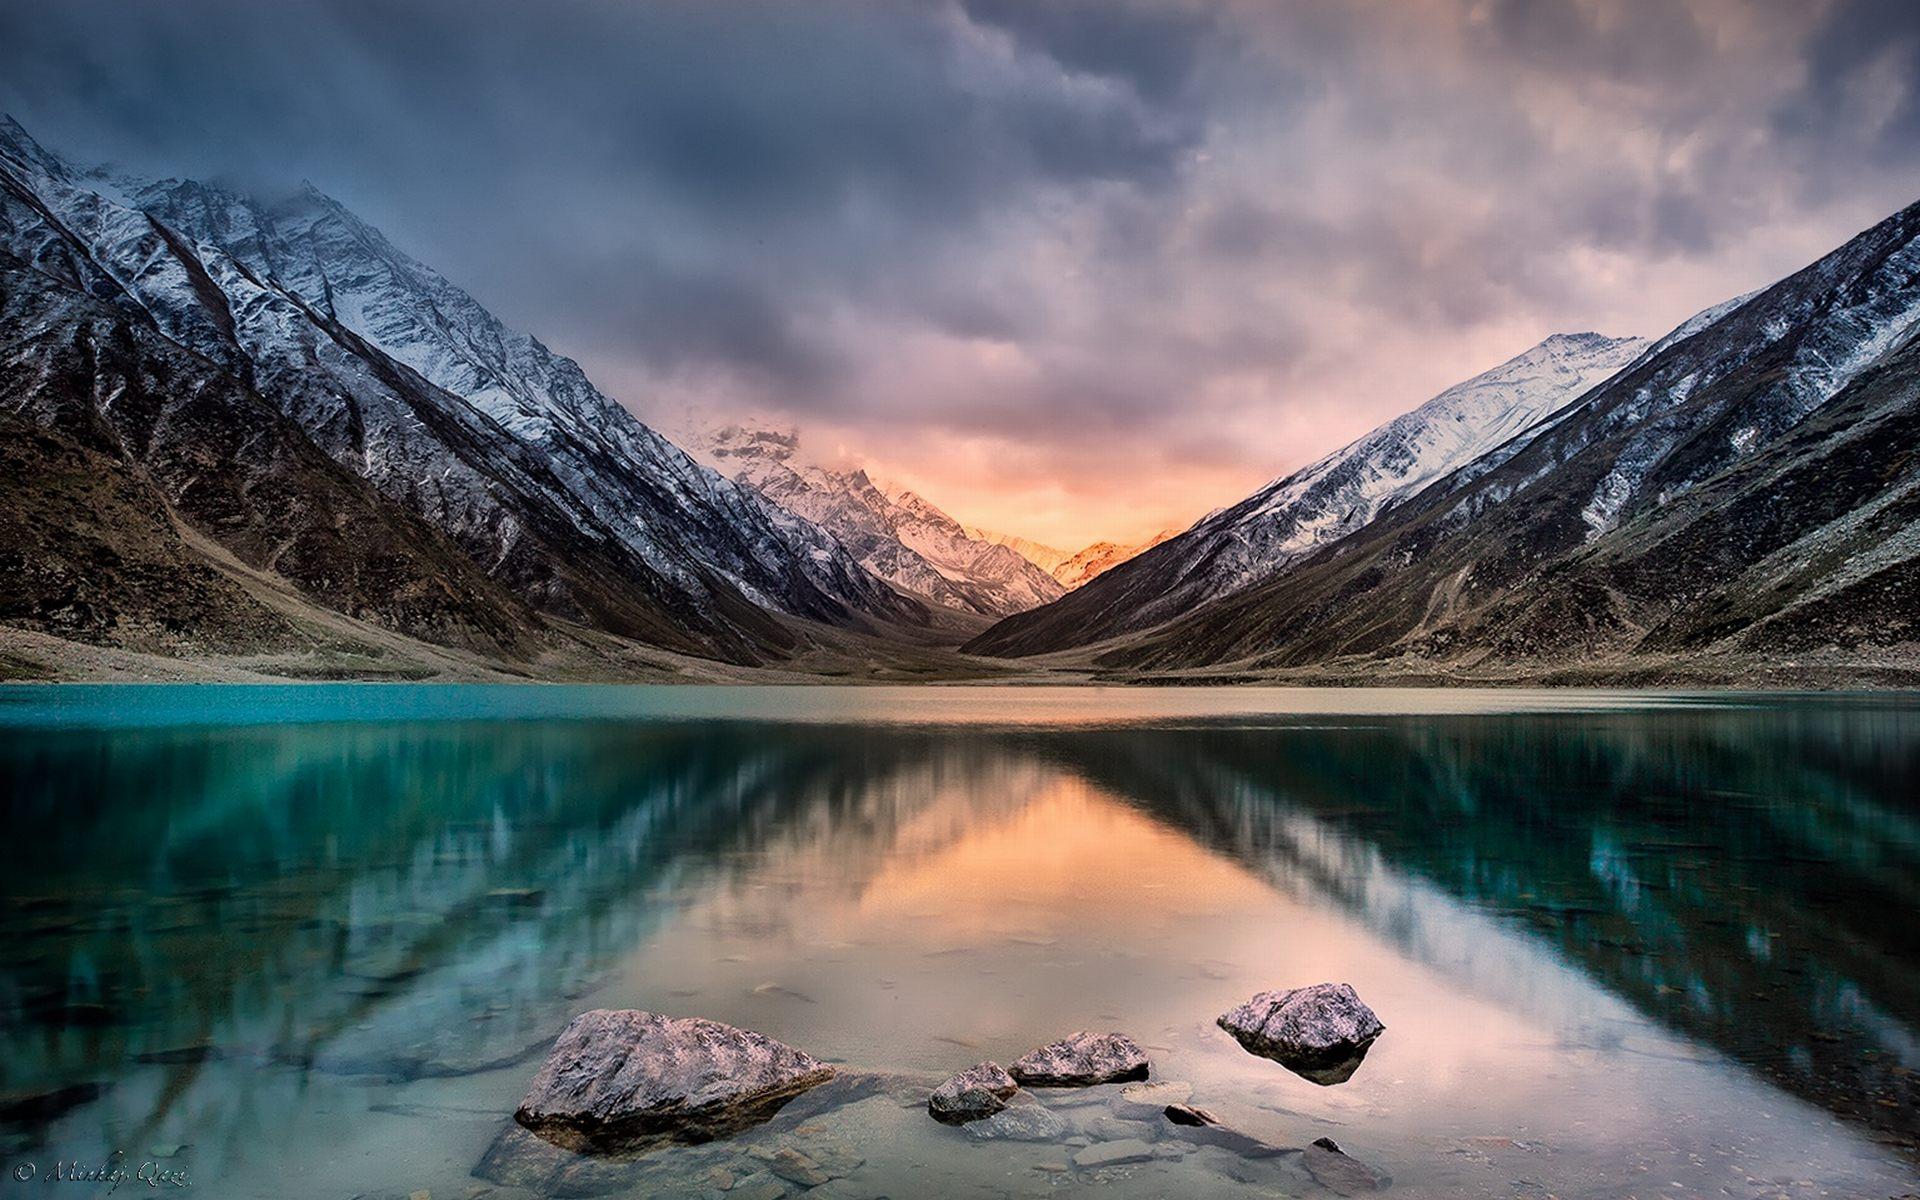 Stunning Kashmir, Shogran, & Glacial Naran, Babusar Top Holiday Travel and Tour Packages